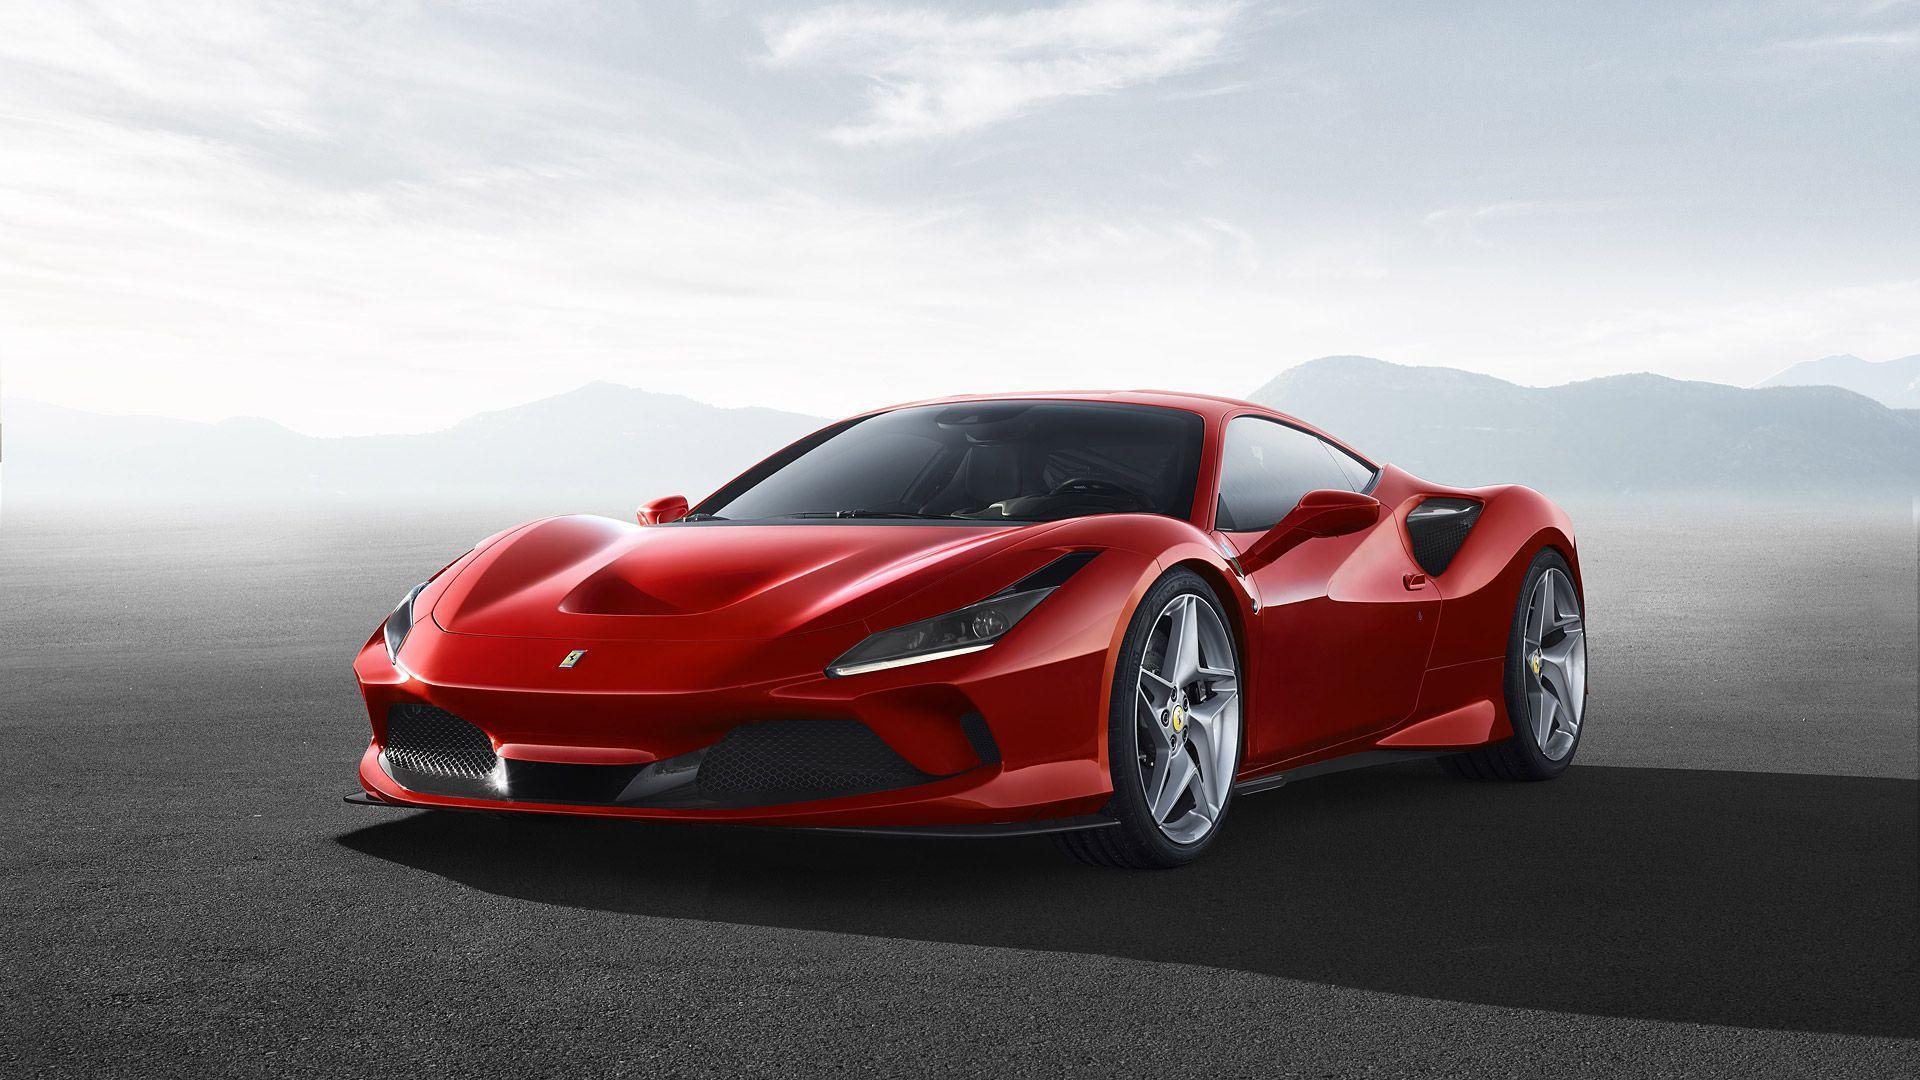 Ferrari F8 Tributo Wallpapers Top Free Ferrari F8 Tributo Backgrounds Wallpaperaccess